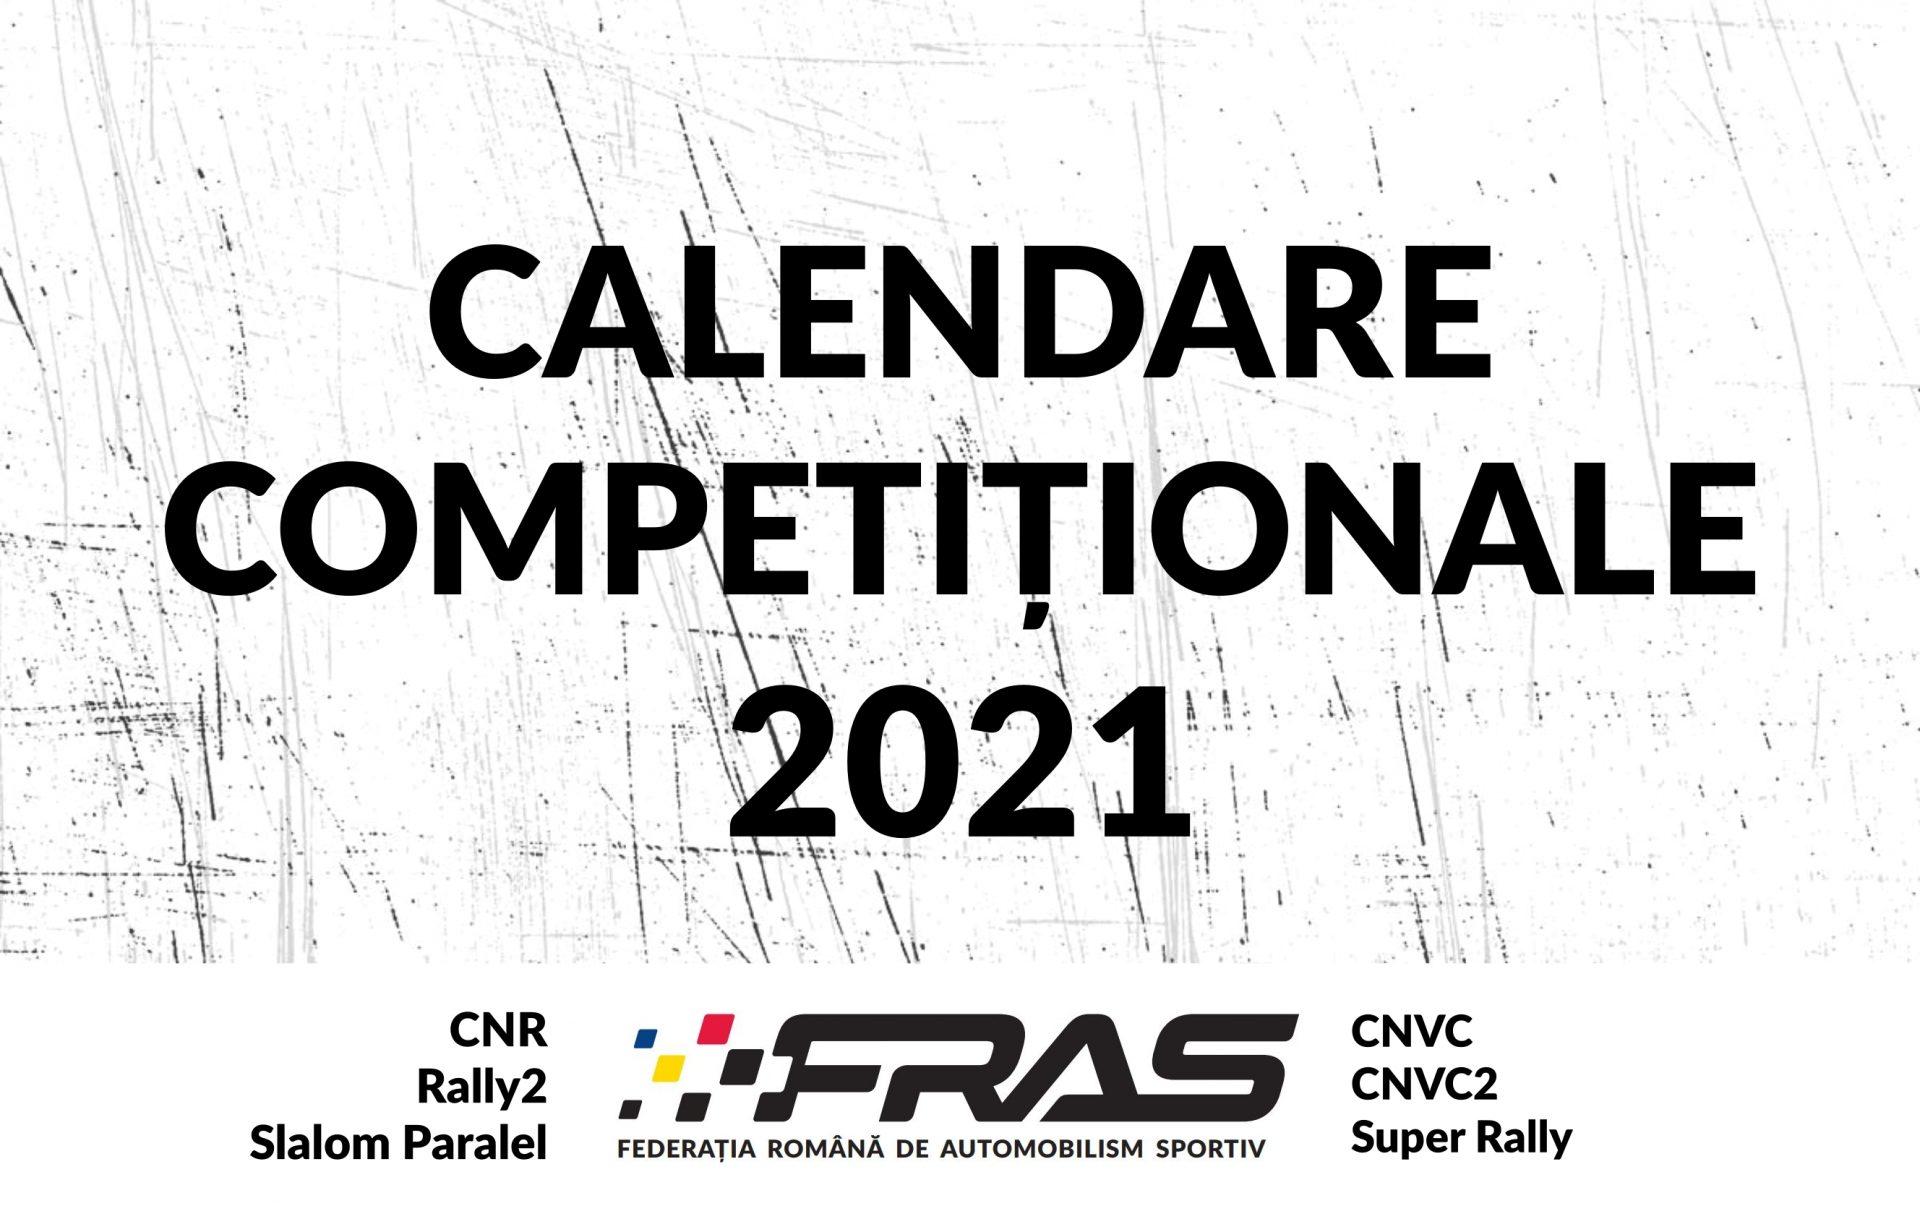 Calendare Competiționale 2021